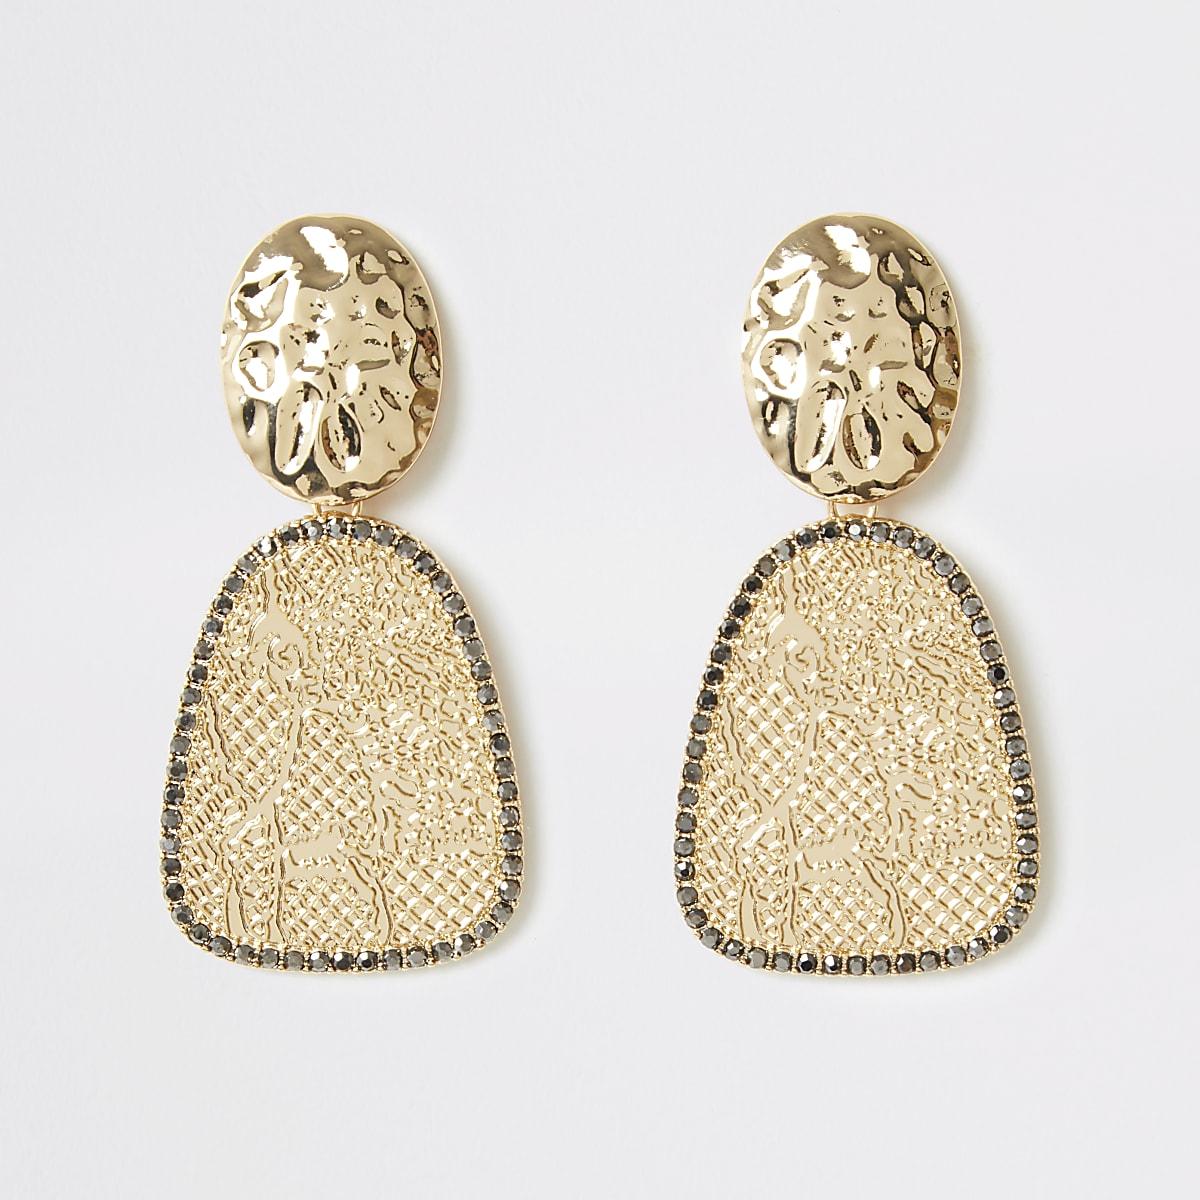 Gold color snake drop earrings